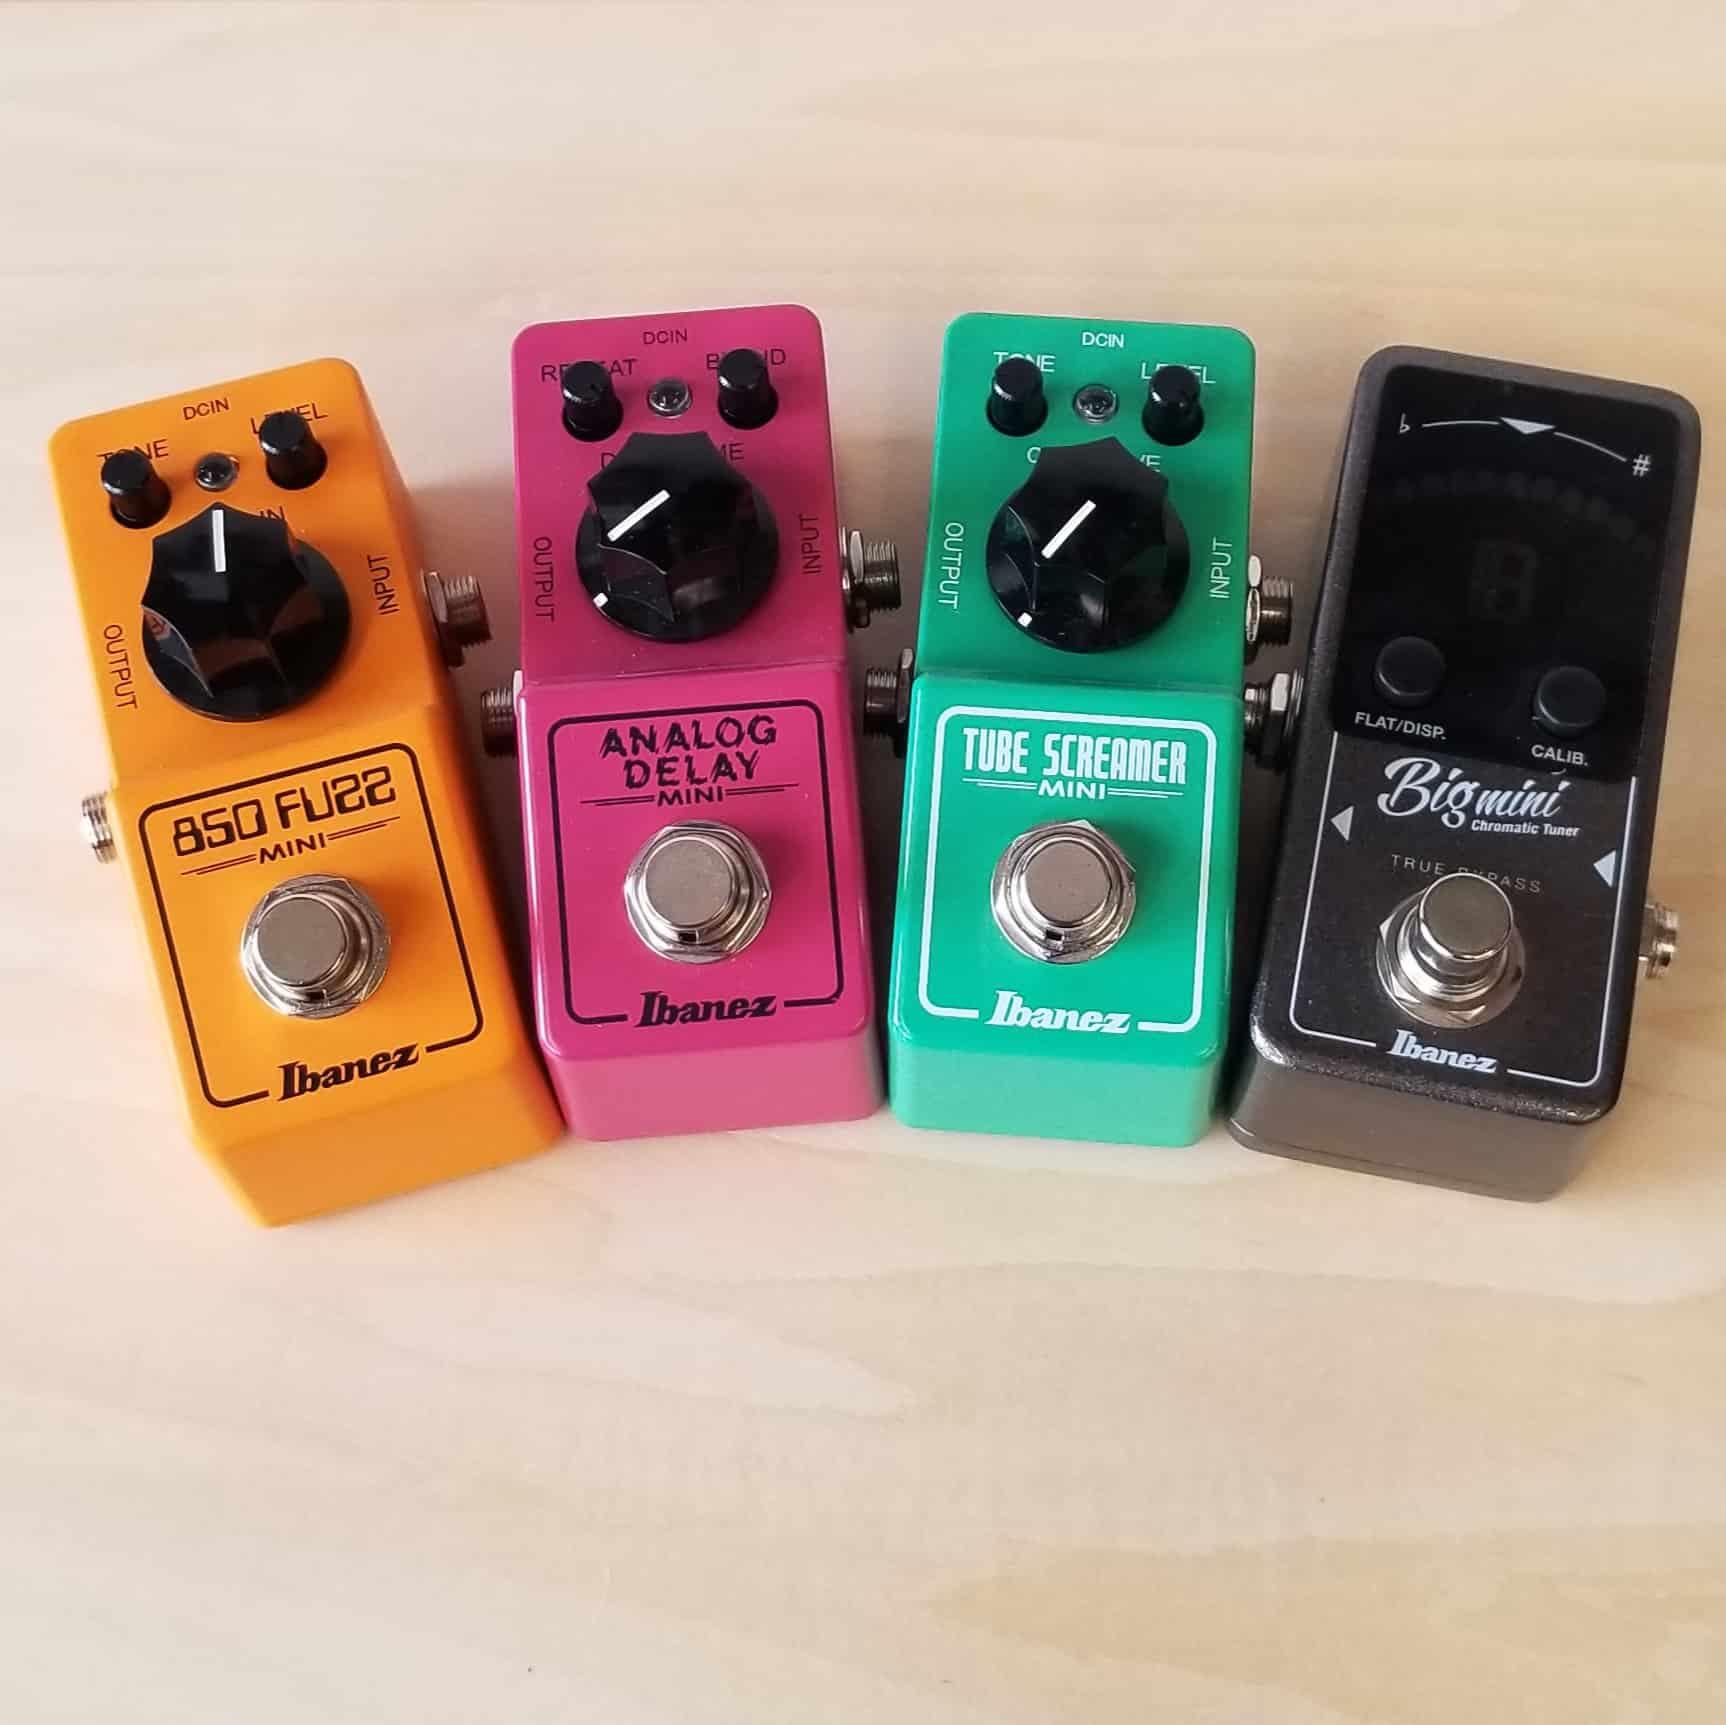 Ibanez Mini Effects pedals 850 Fuzz, Analog Delay, Tube Screamer, Big Mini